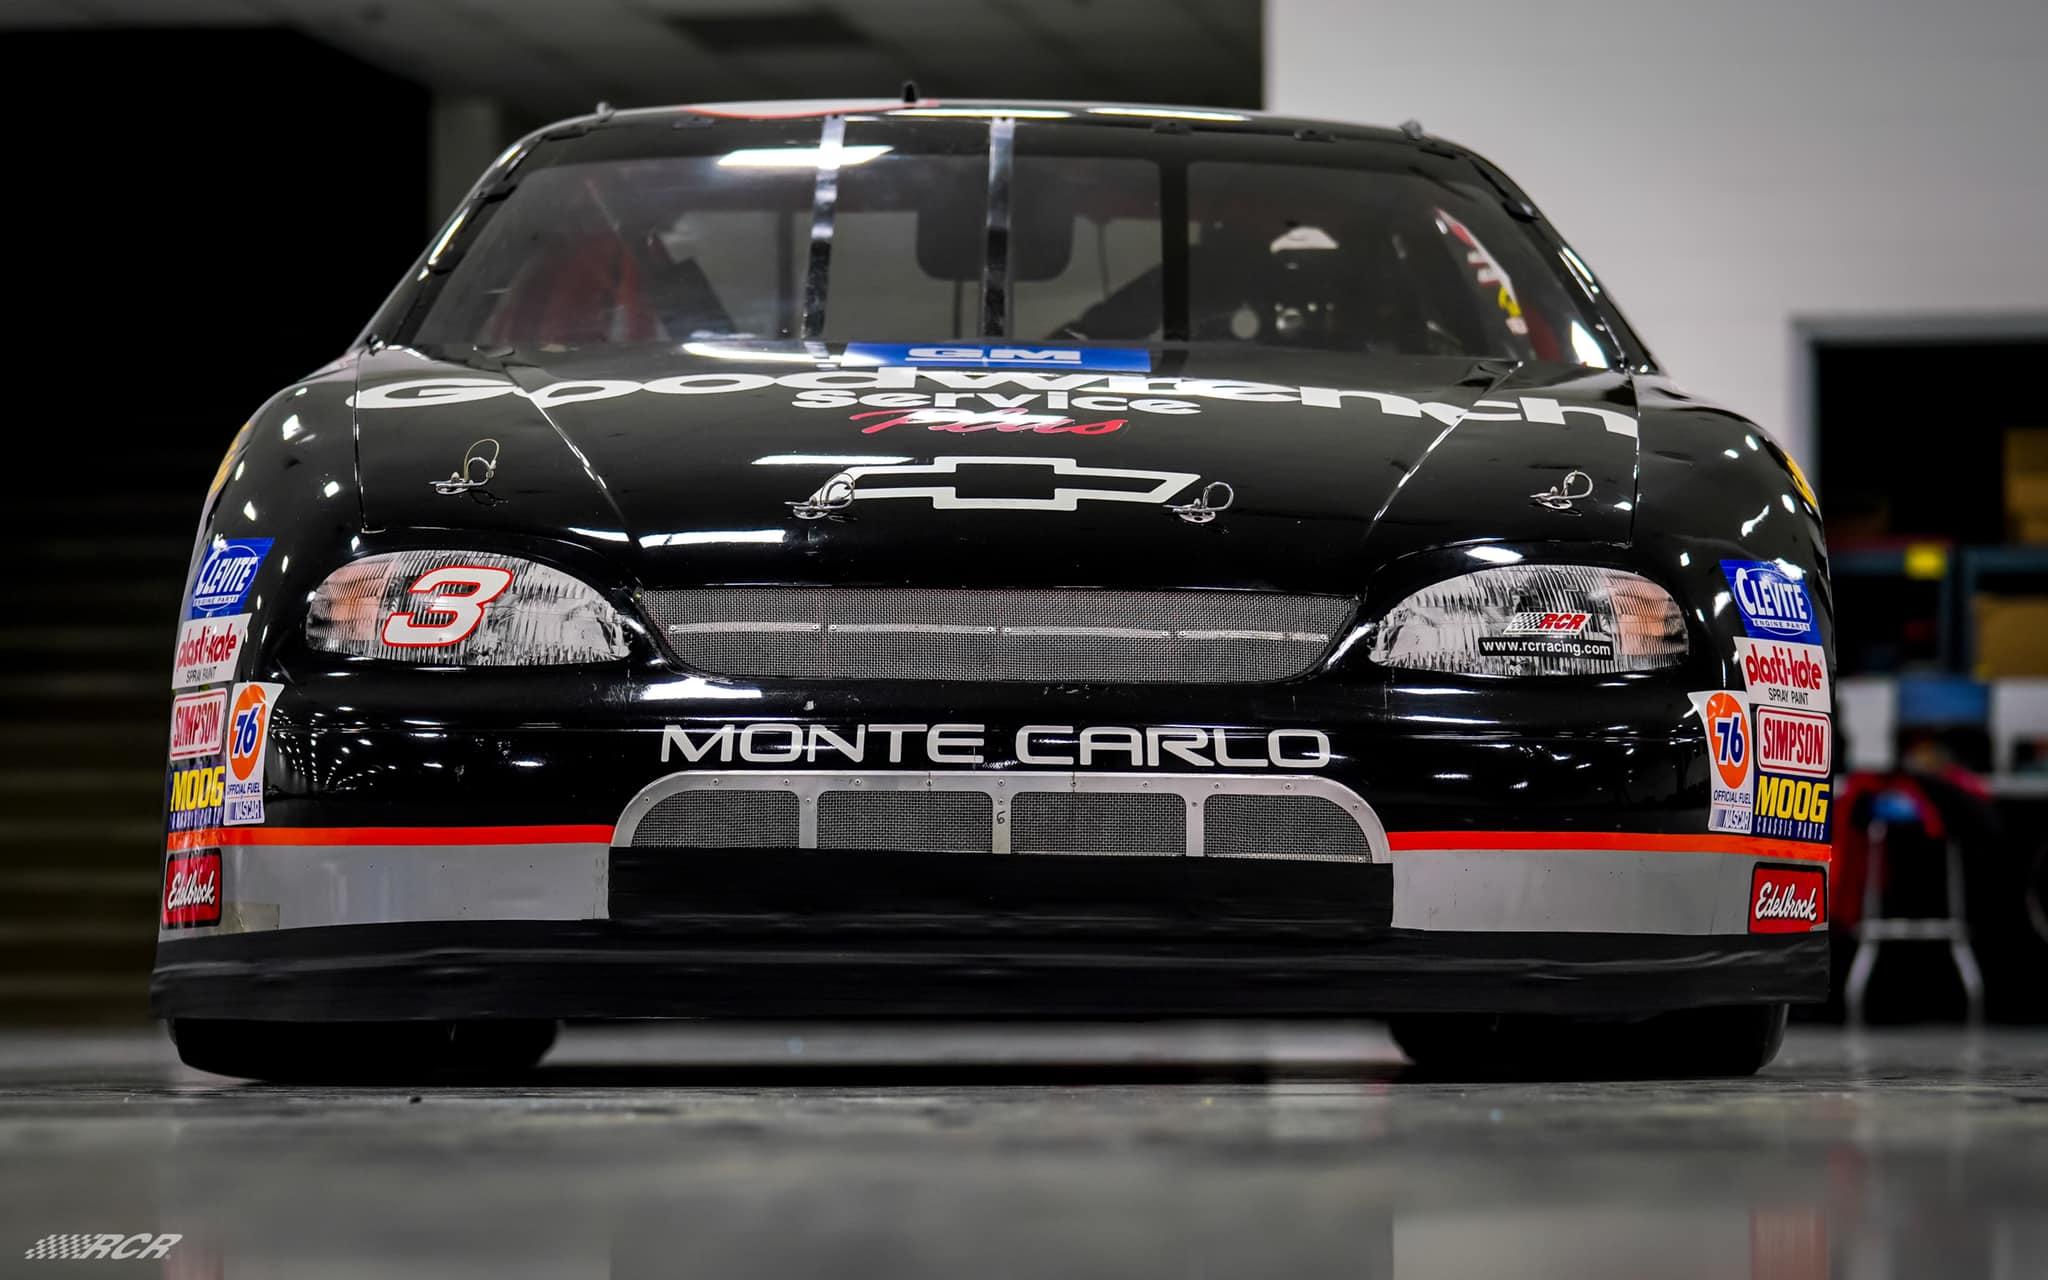 NASCAR race car driven by Dale Earnhardt - RCR